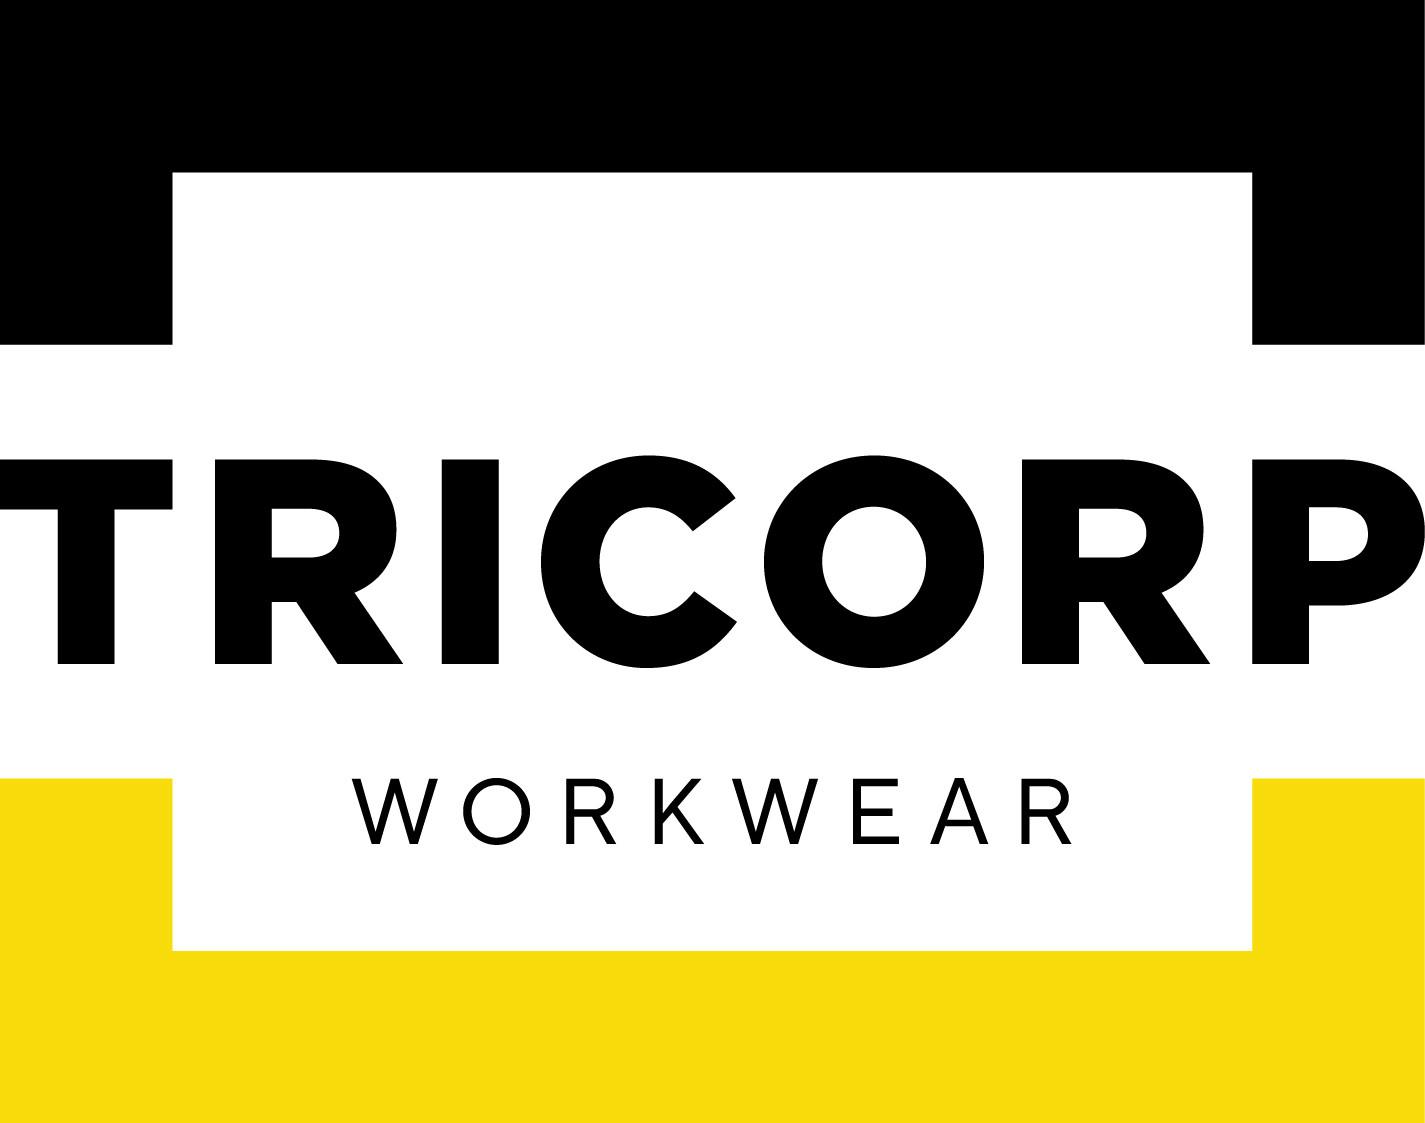 Tricorp Workwear kopen?